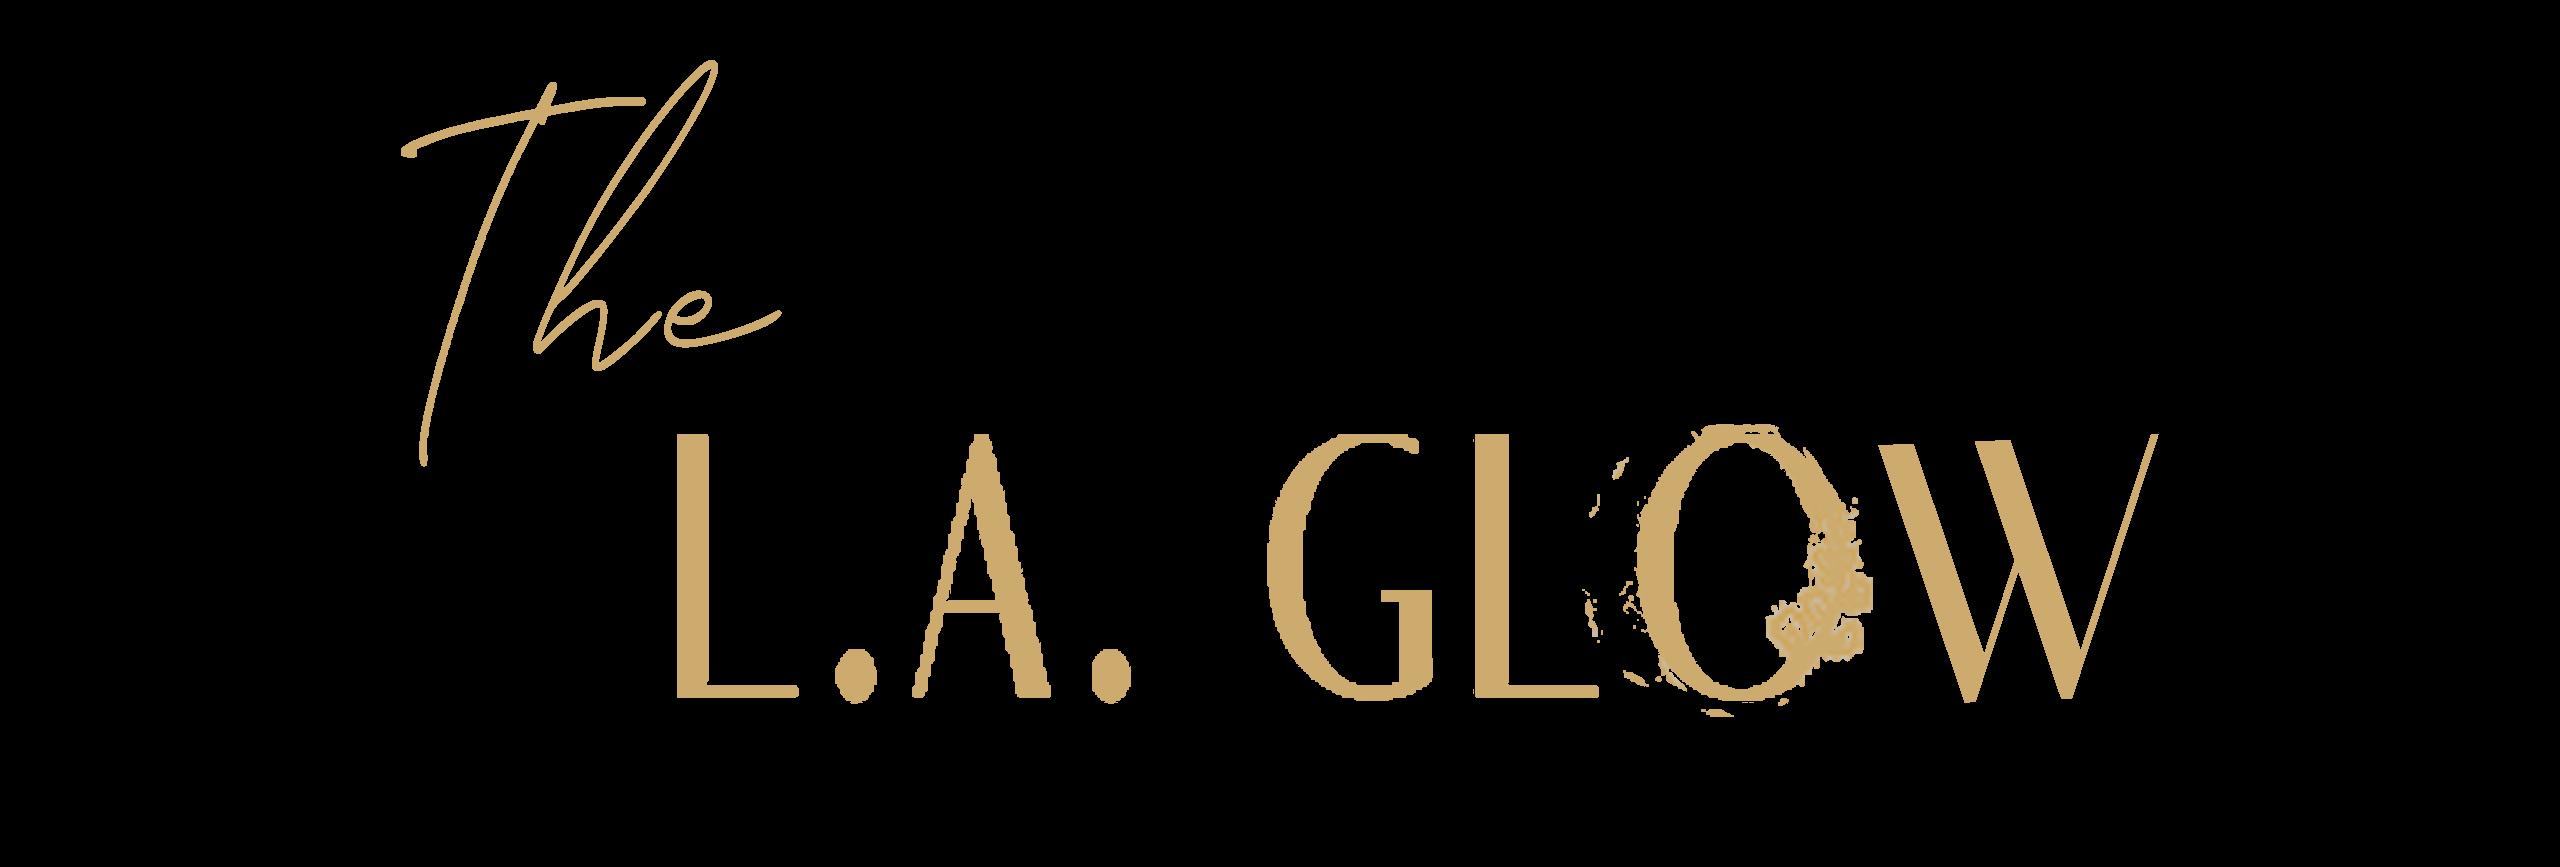 The L.A. Glow